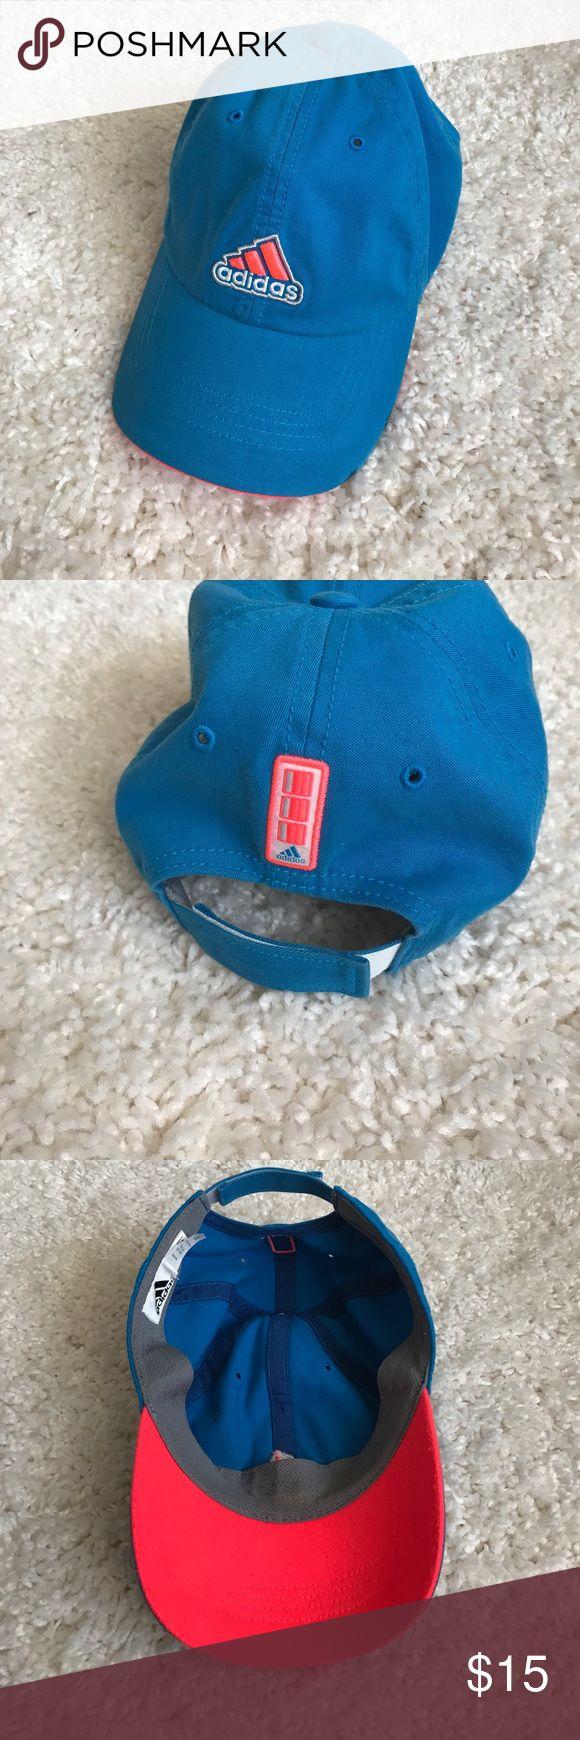 Adidas Baseball Hat Adidas Baseball Hat in Hot Pink and Baby Blue adidas Accessories Hats